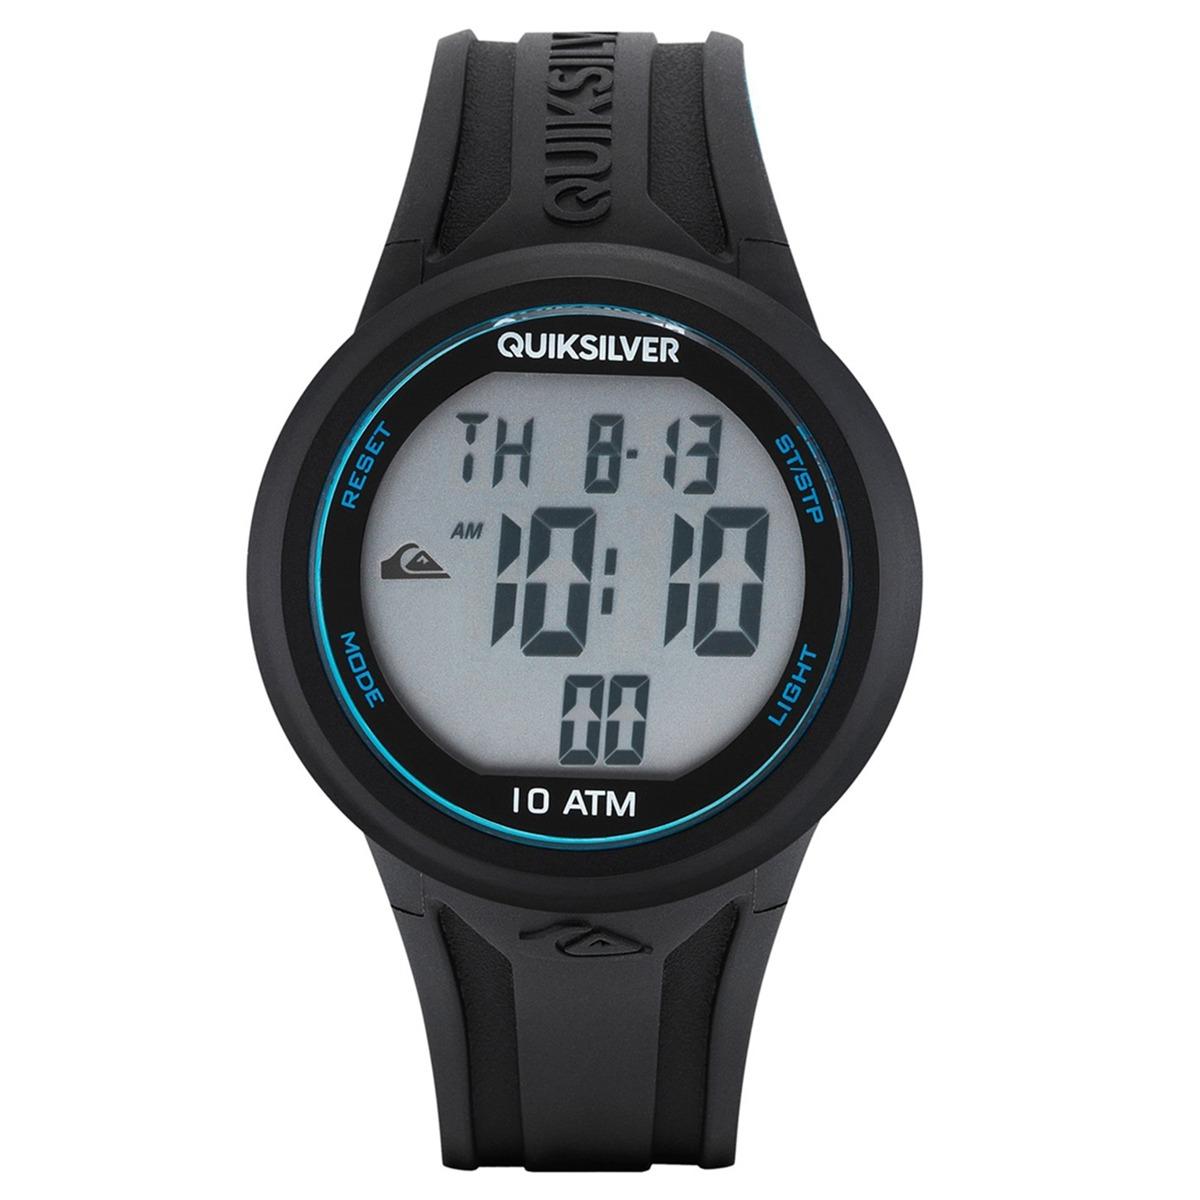 7ae7bac206971 Relógio Masculino Quiksilver The Barrel Black - R  417,49 em Mercado ...